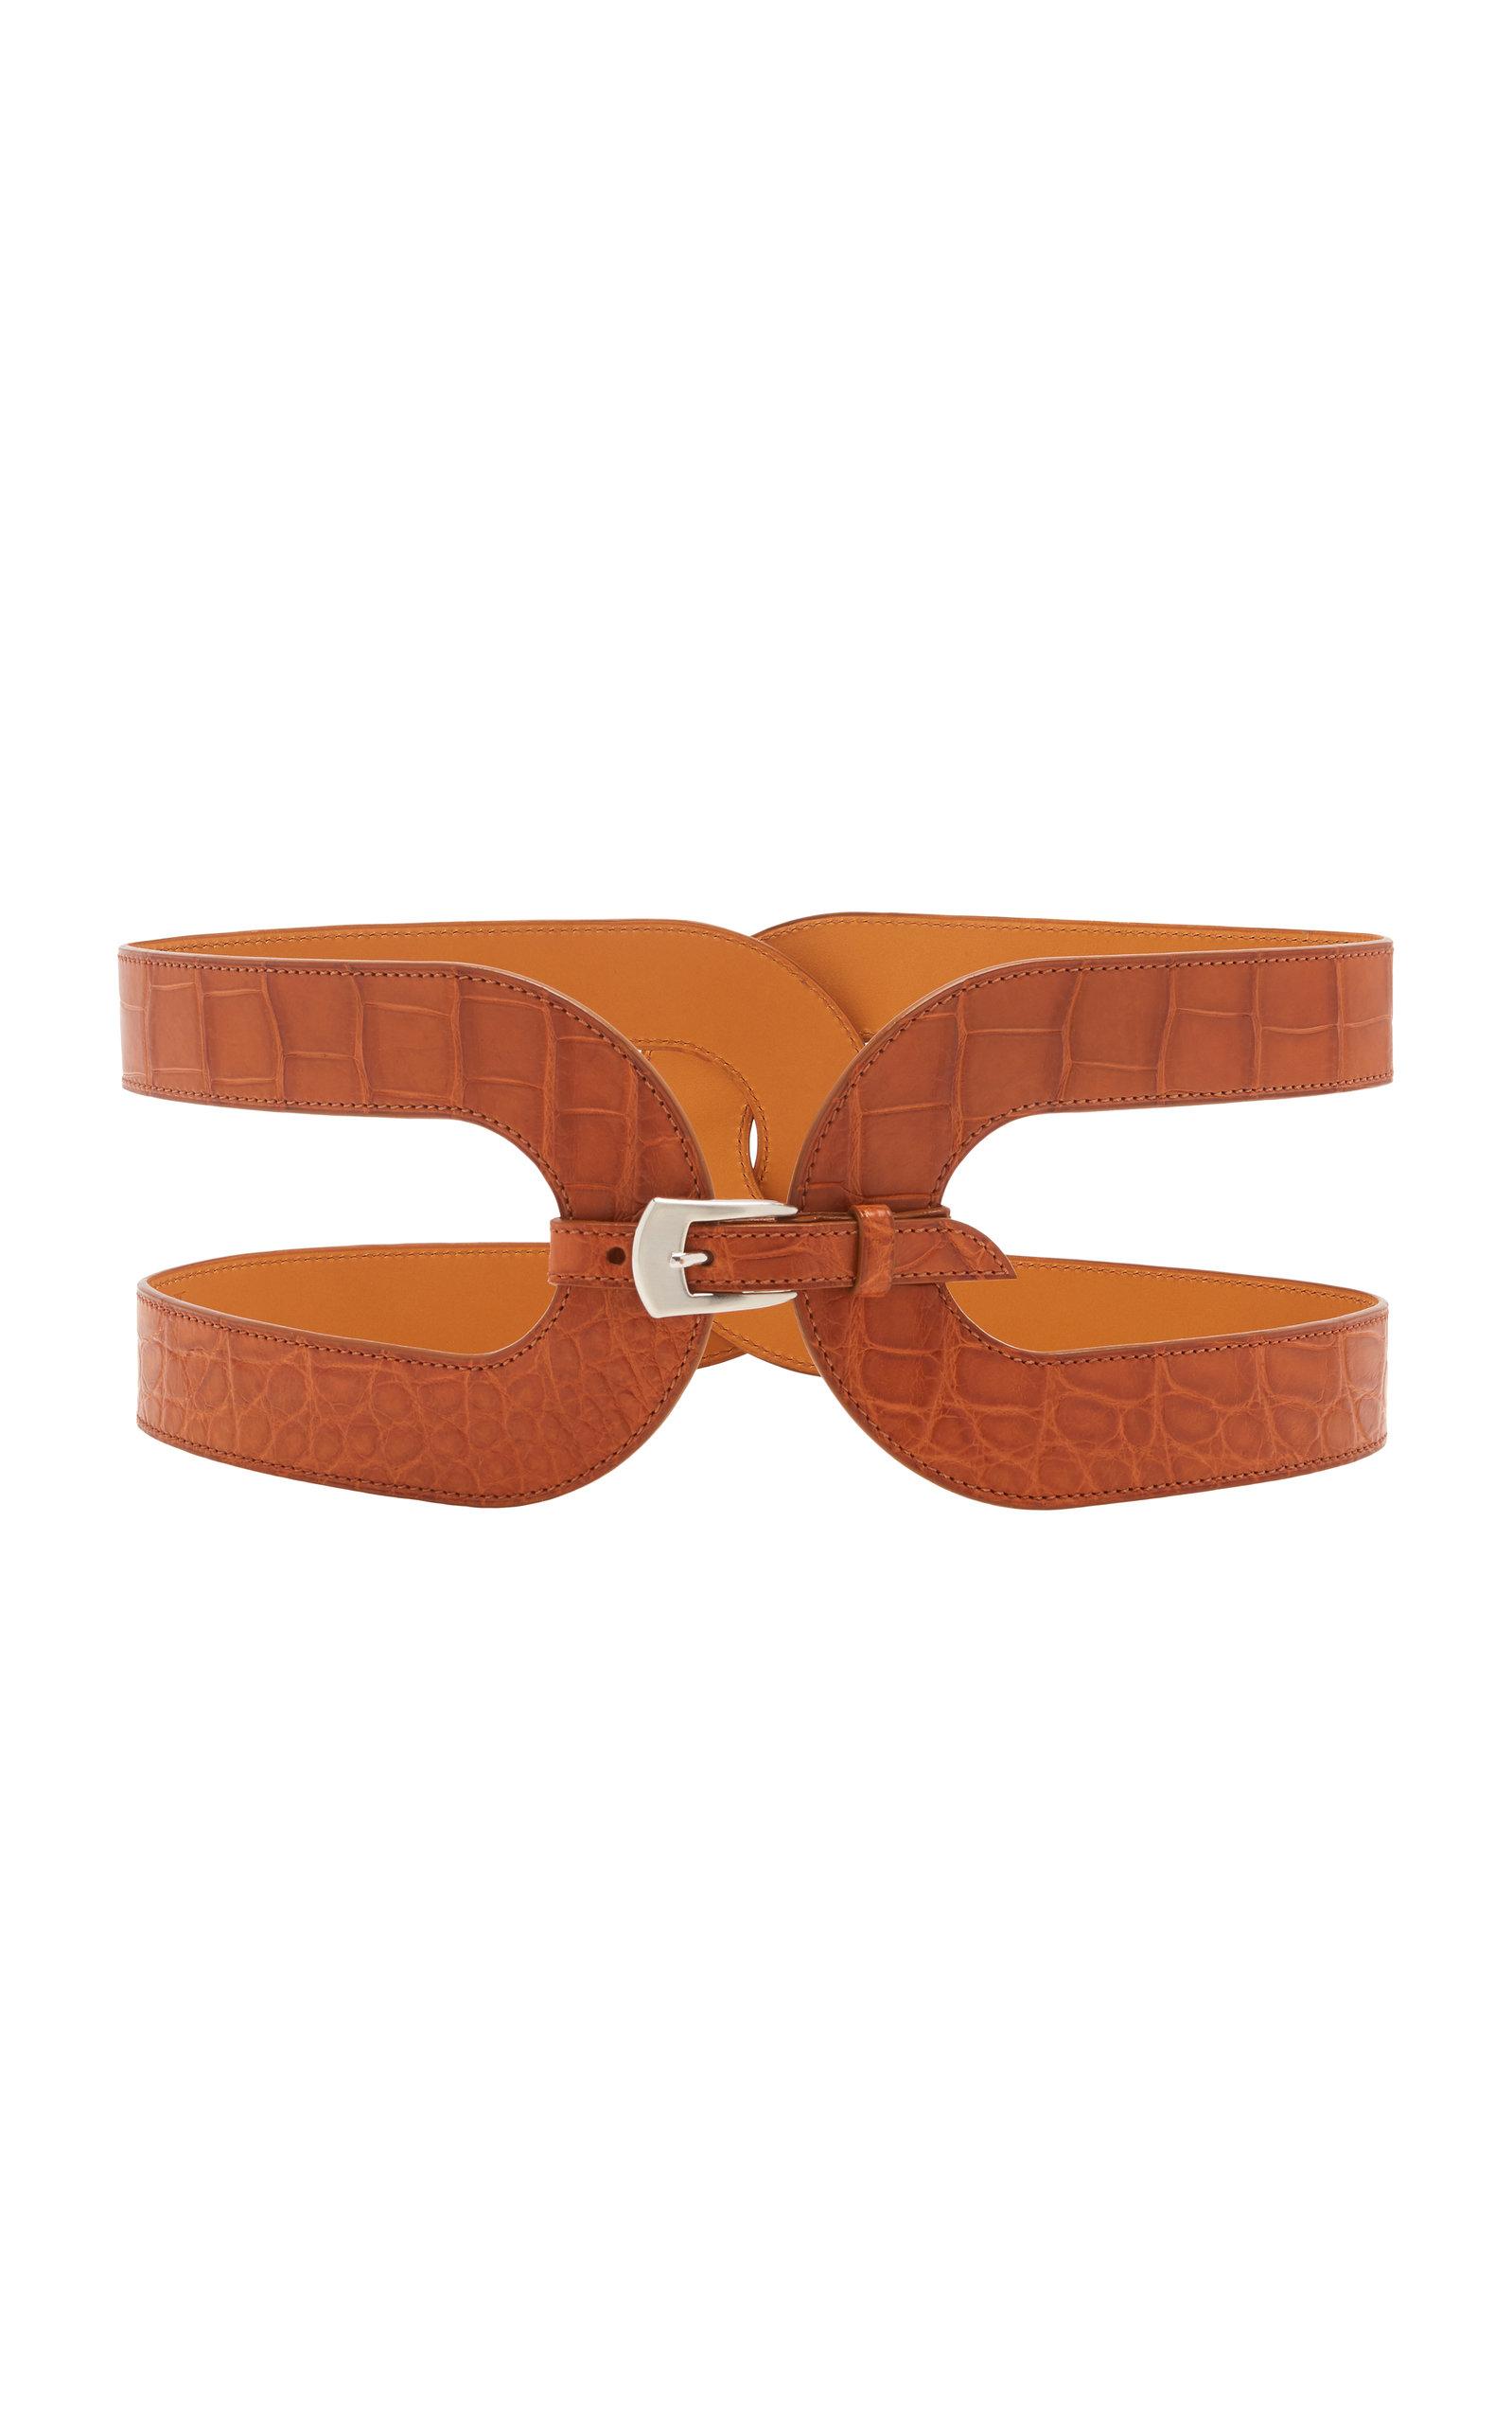 Maison Vaincourt – Women's Exclusive Crocodile Waist Belt – Brown/black – Moda Operandi